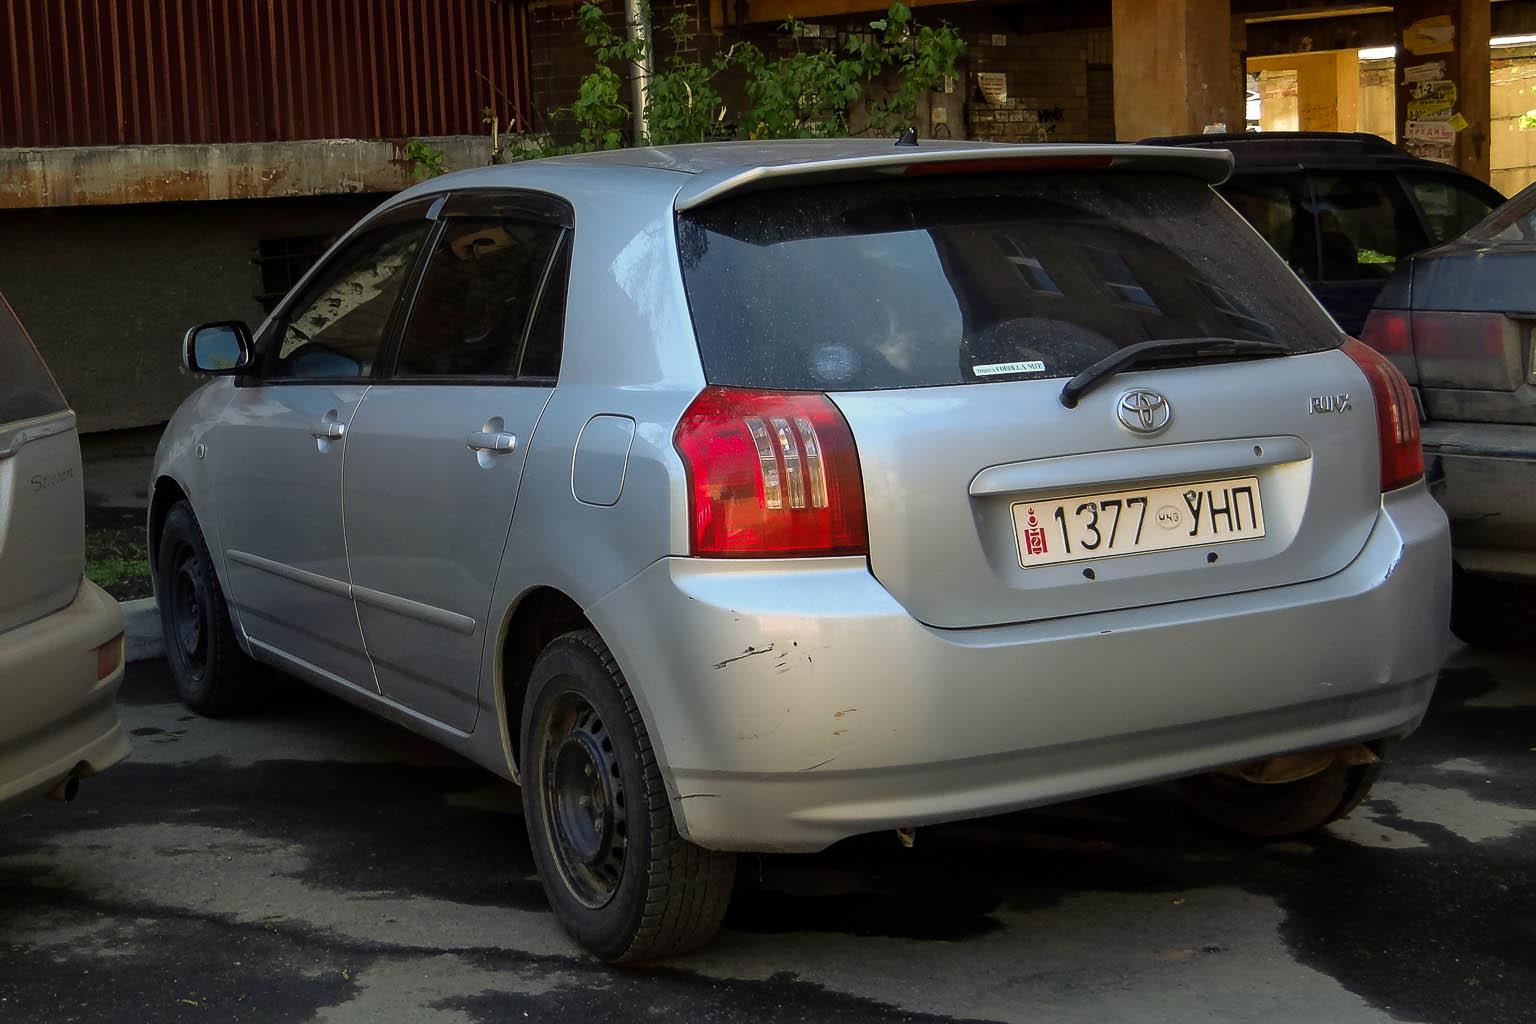 Filetoyota Corolla Runx Mongolian Licence Plate 1337 Pimped Toyota